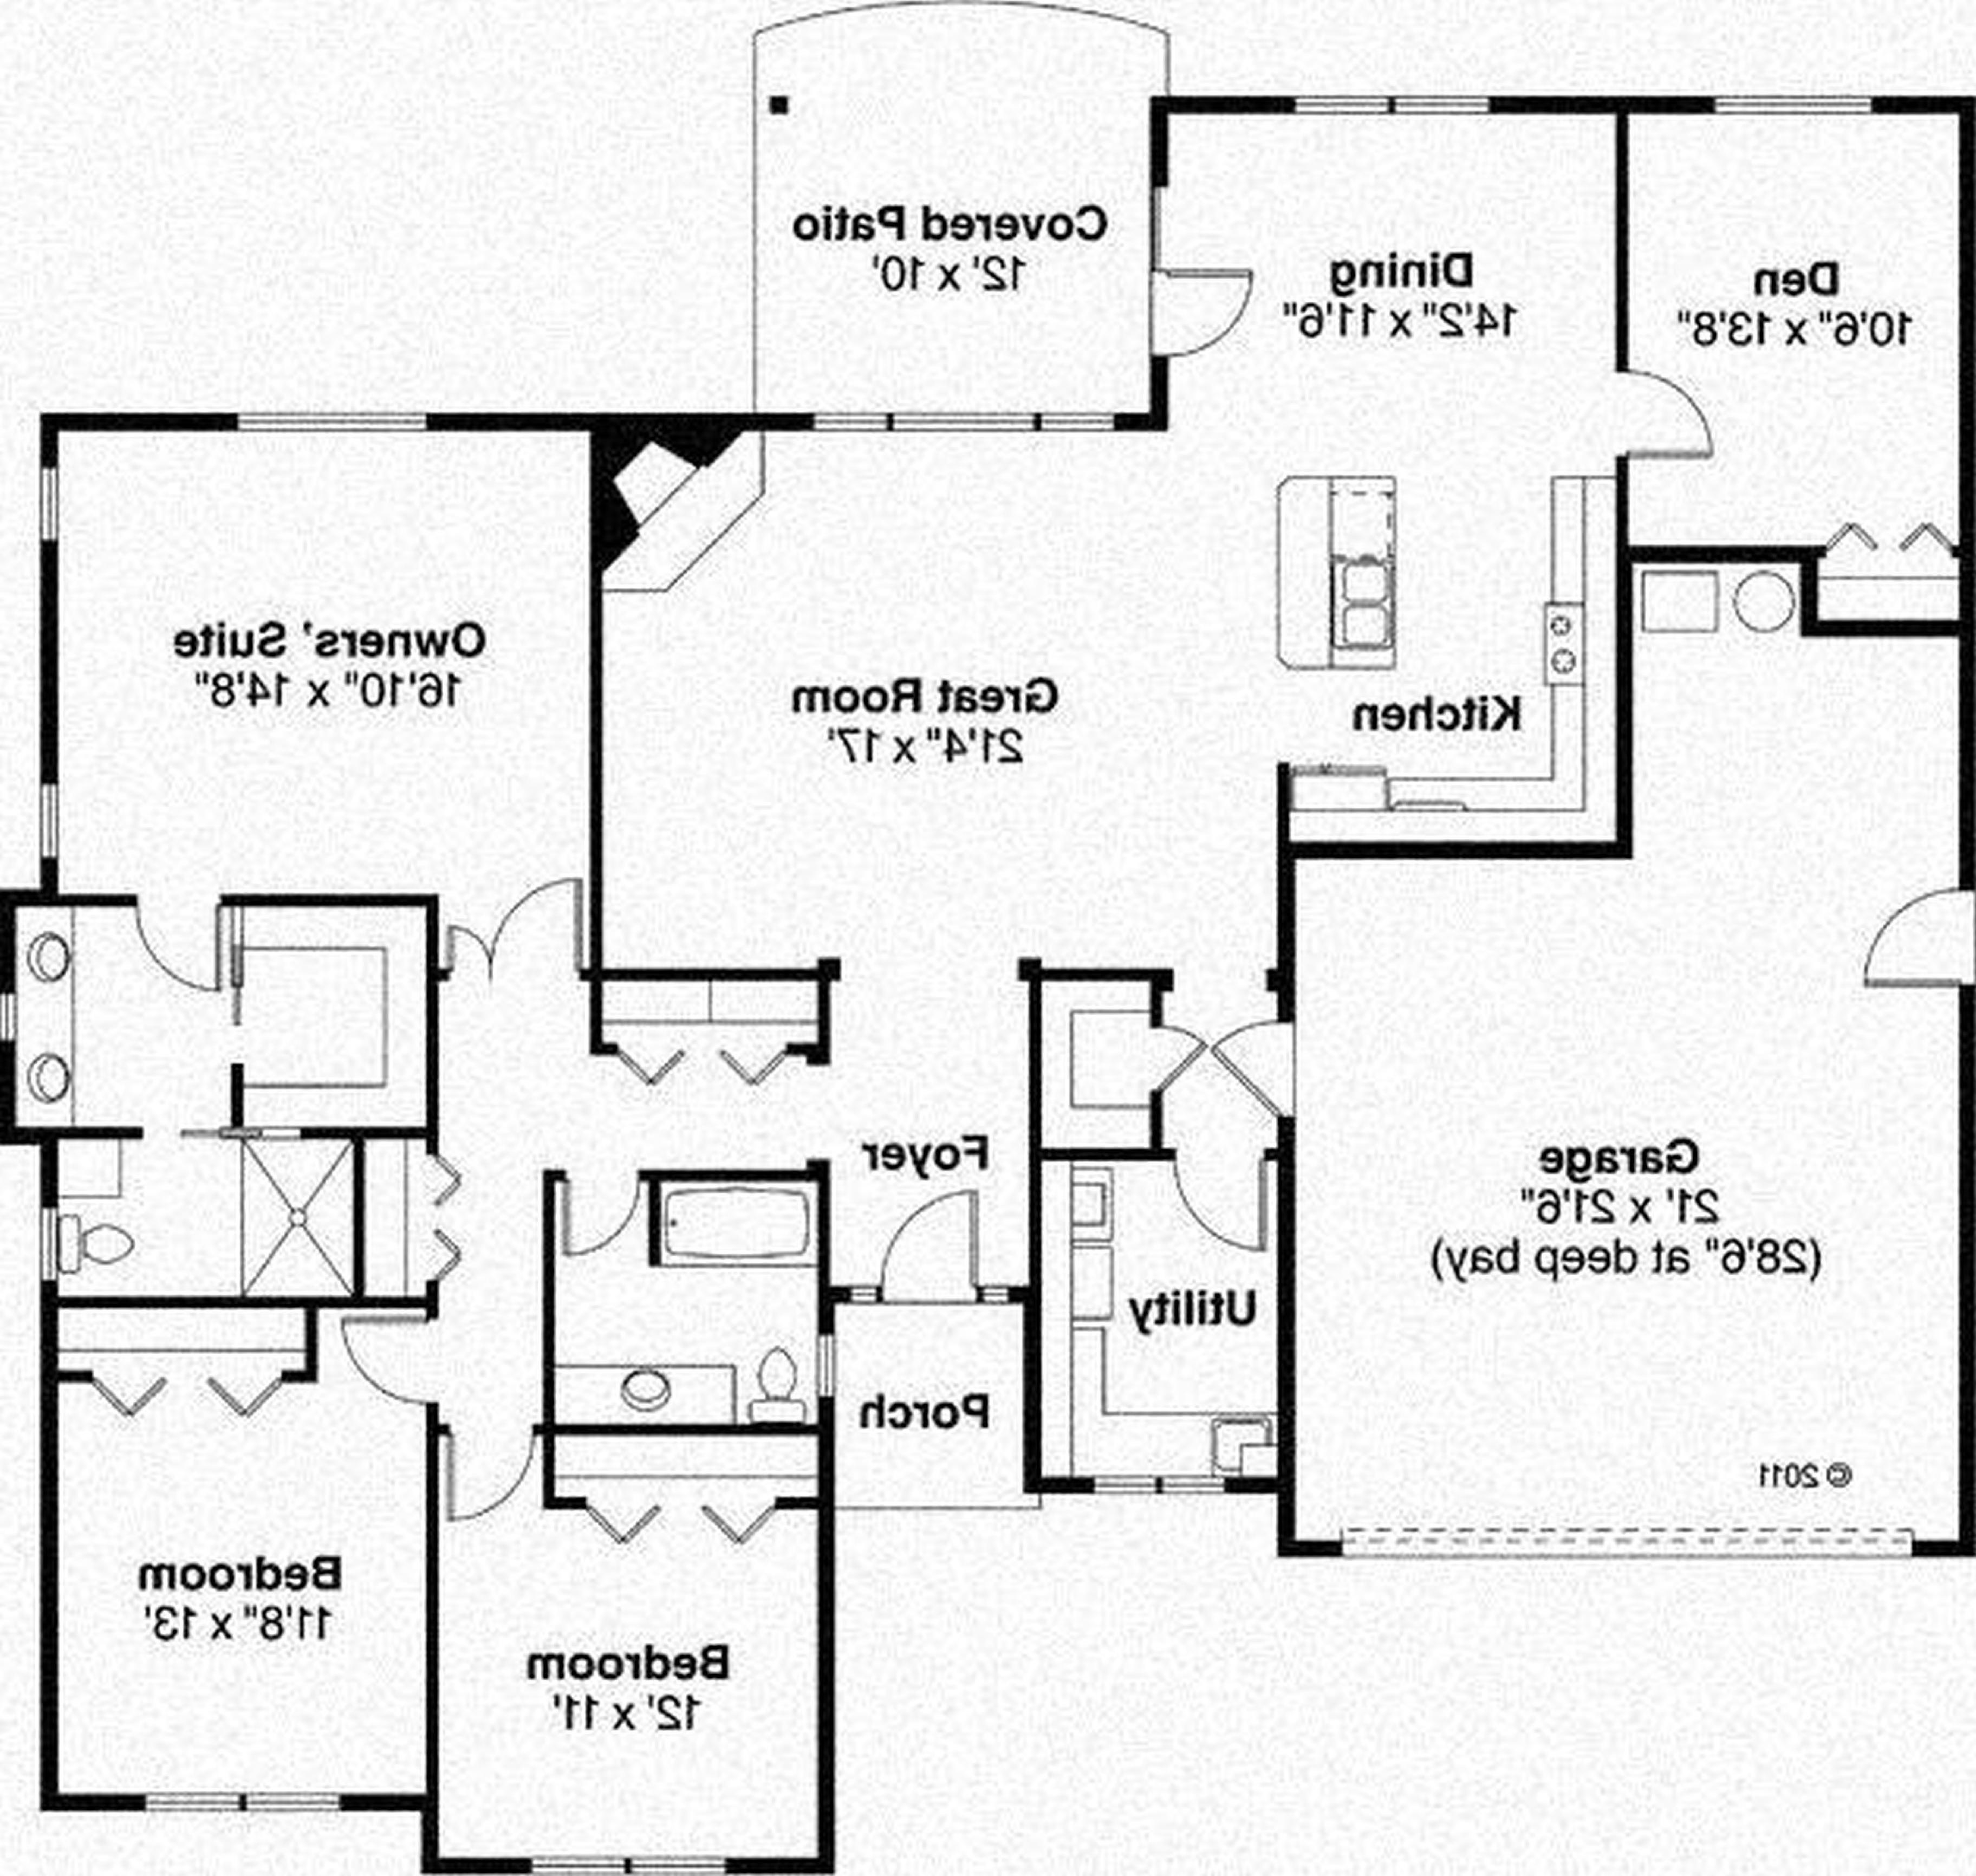 House Plans Blueprint Stairs Pinned By Www Modlar Com Minecraft